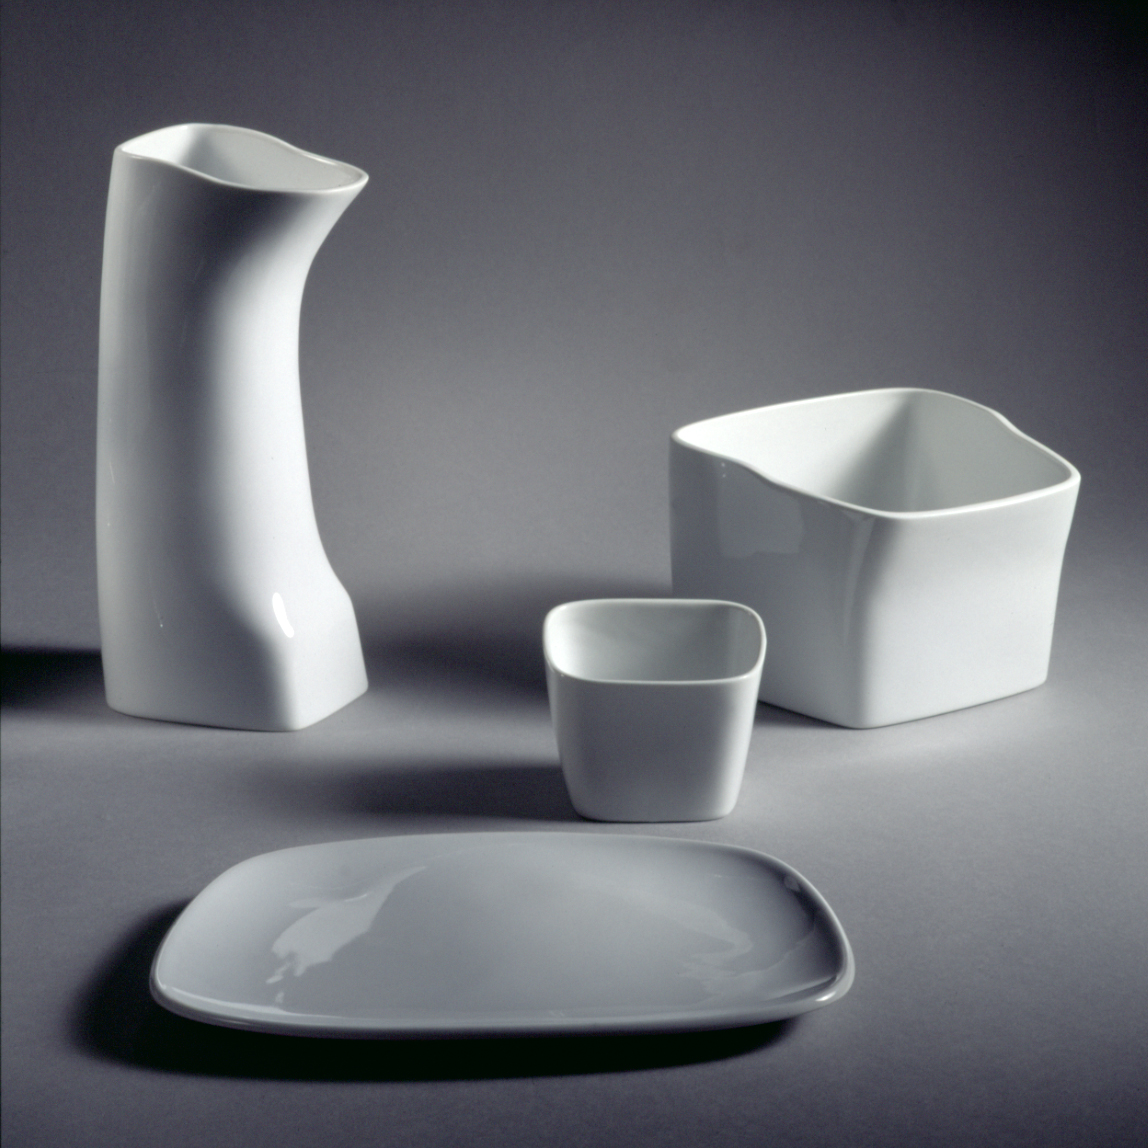 Keramiker Marianne Nielsen - Fremtidens spisestel, 2000, foto: Ole Akhøj